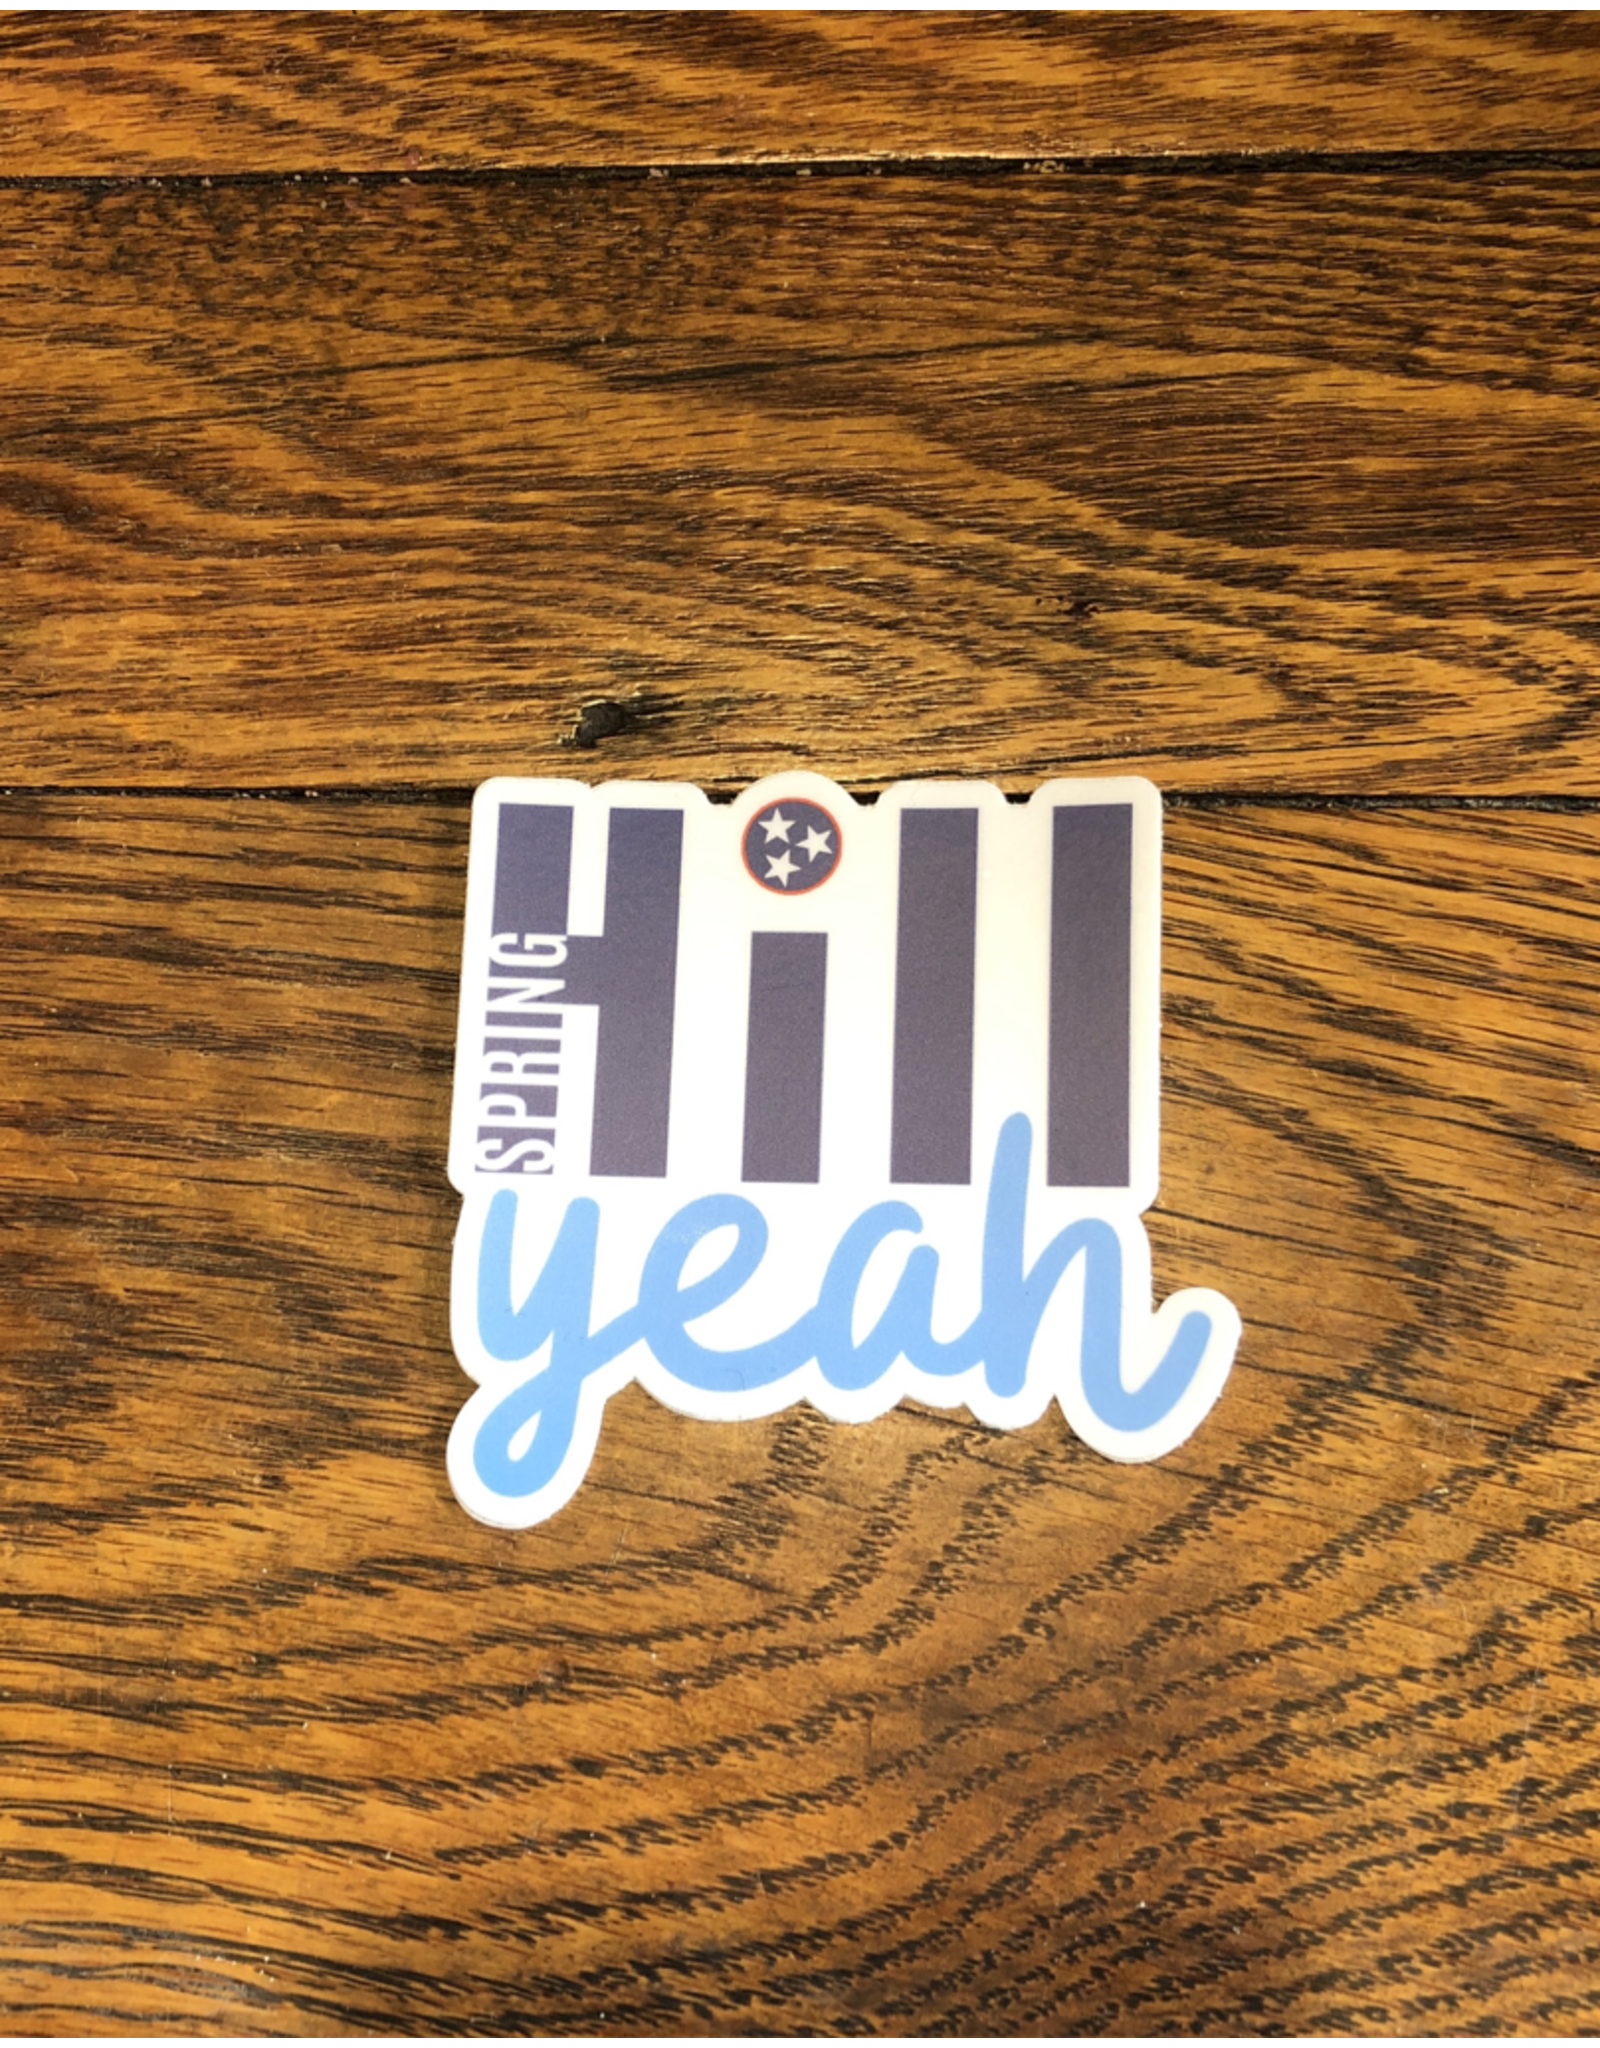 Hill Yeah Sticker